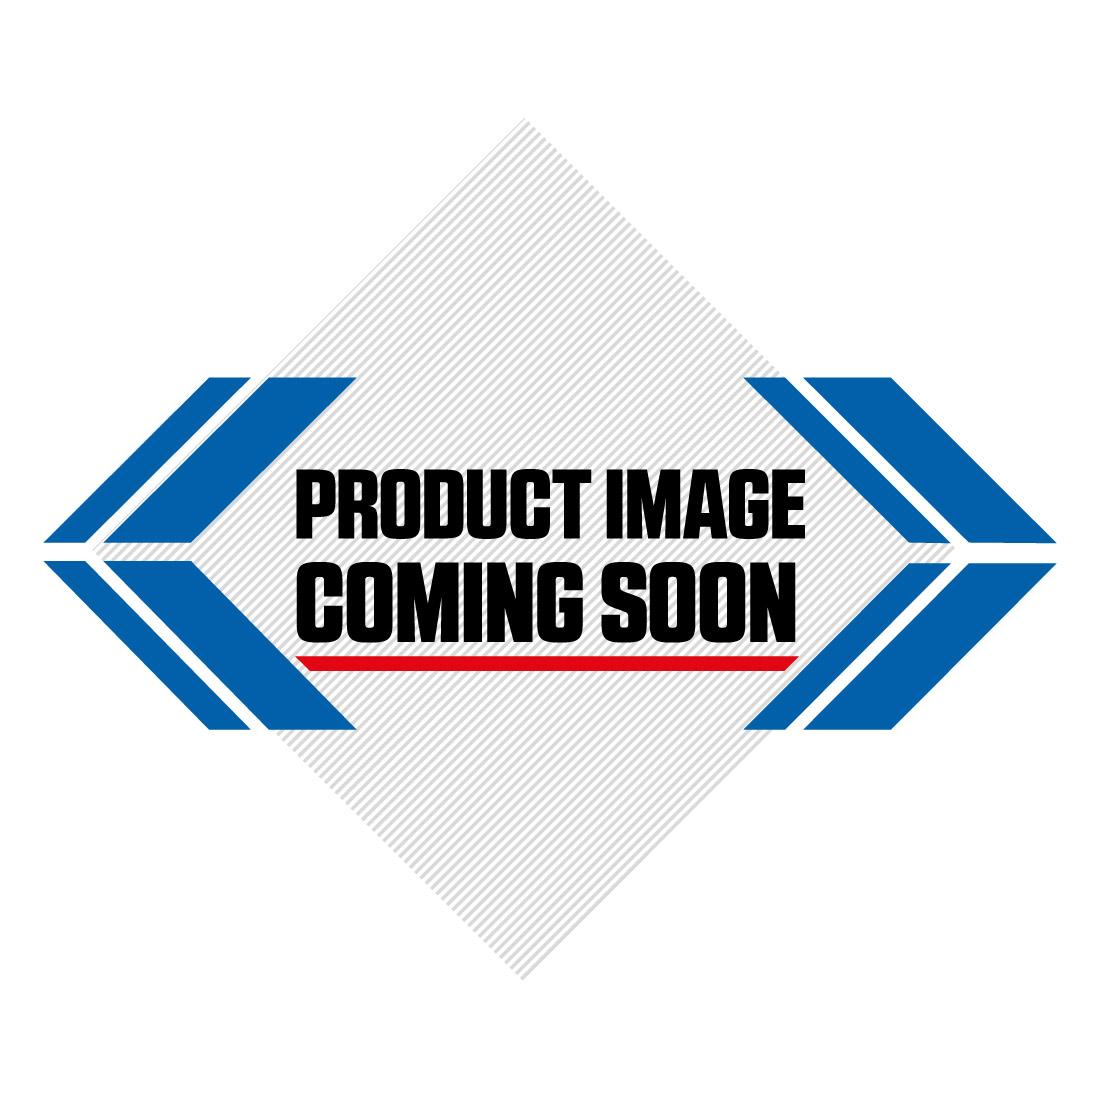 Honda Plastic Kit CRF 230 (08-14) OEM Factory Image-2>